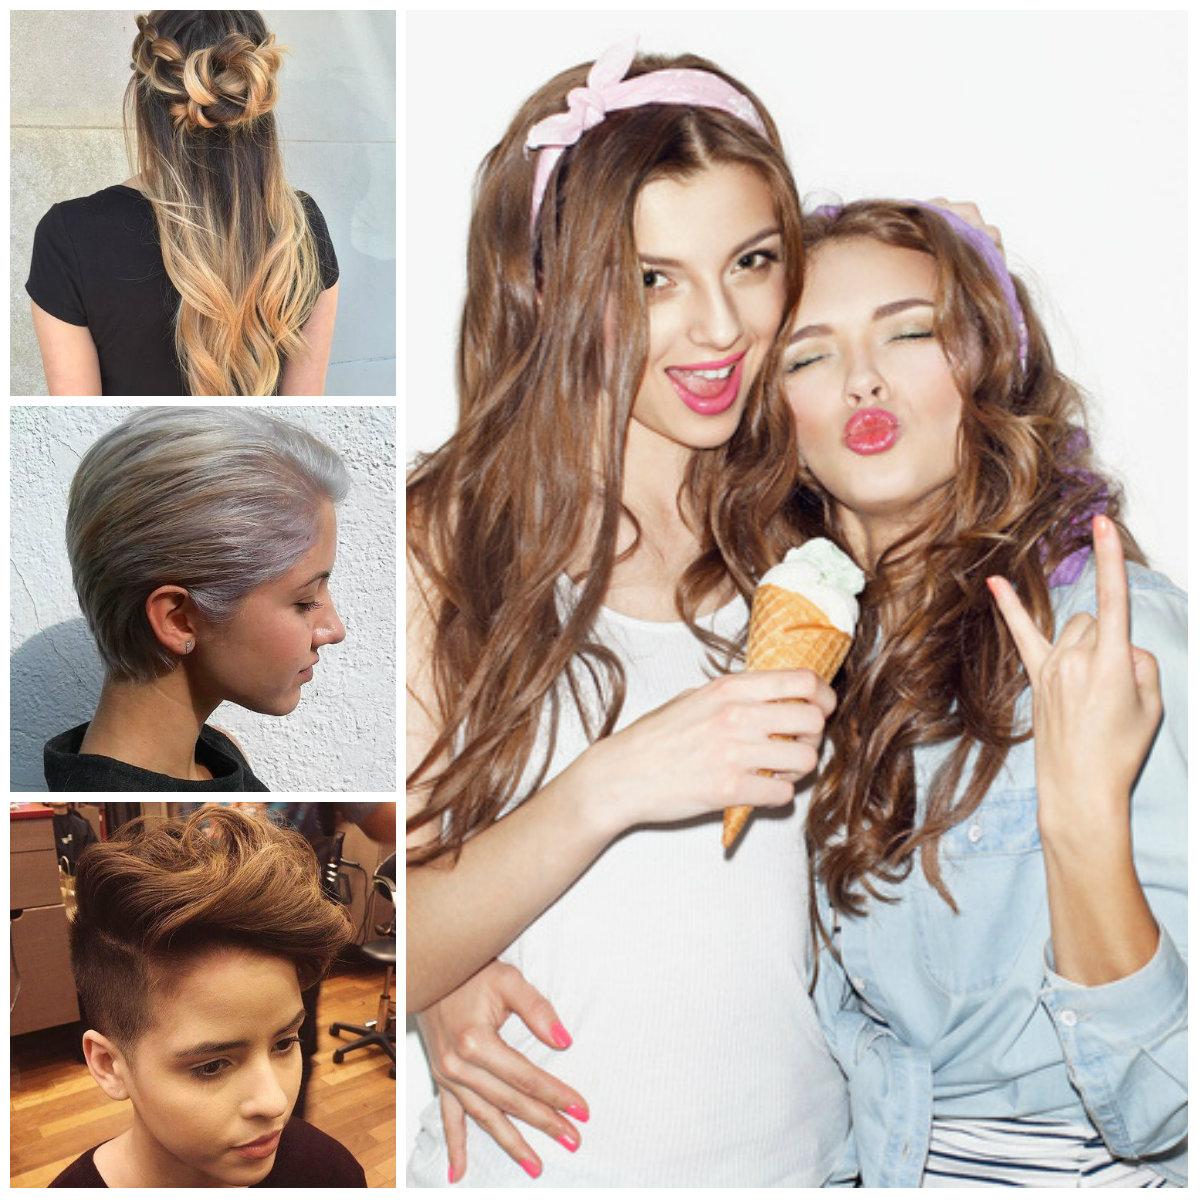 2017 Elegante, Penteados e Cortes de cabelo para Meninas Adolescentes